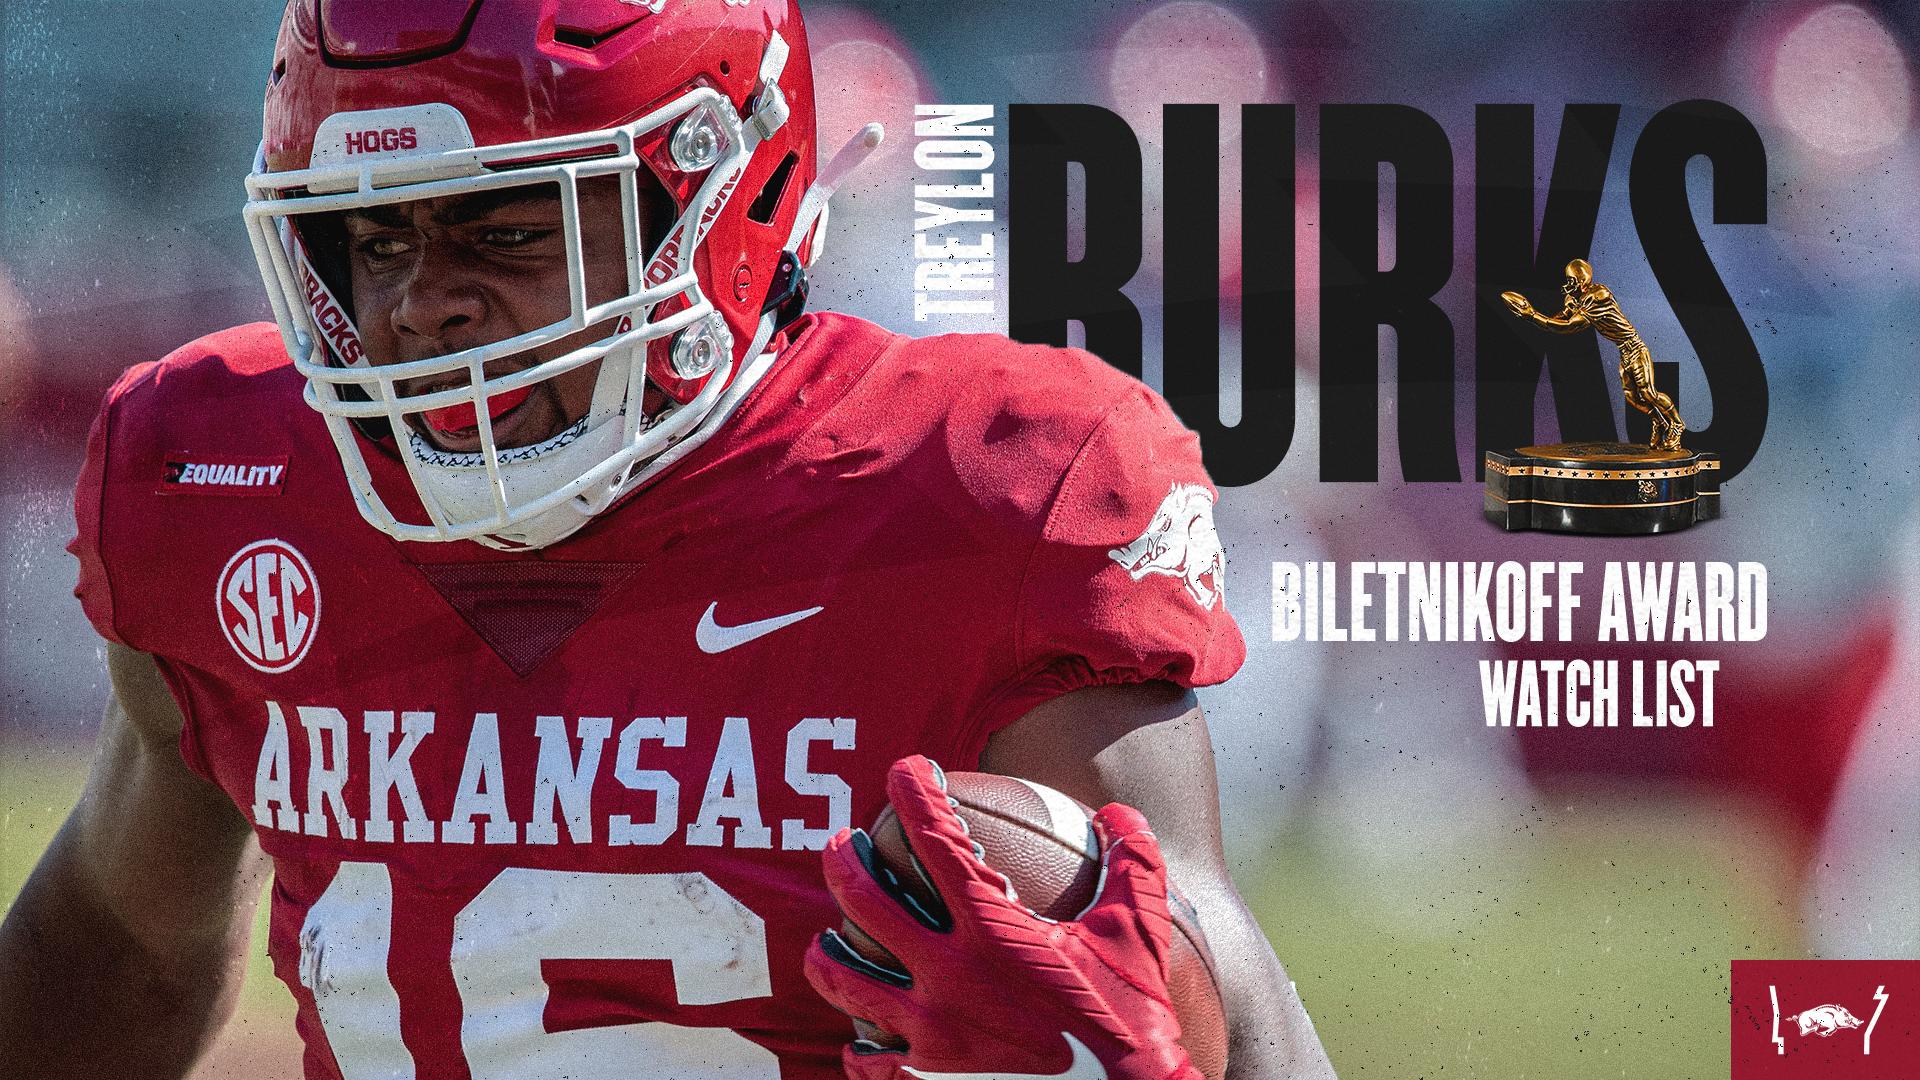 Burks Lands on Biletnikoff Award Watch List | Arkansas Razorbacks